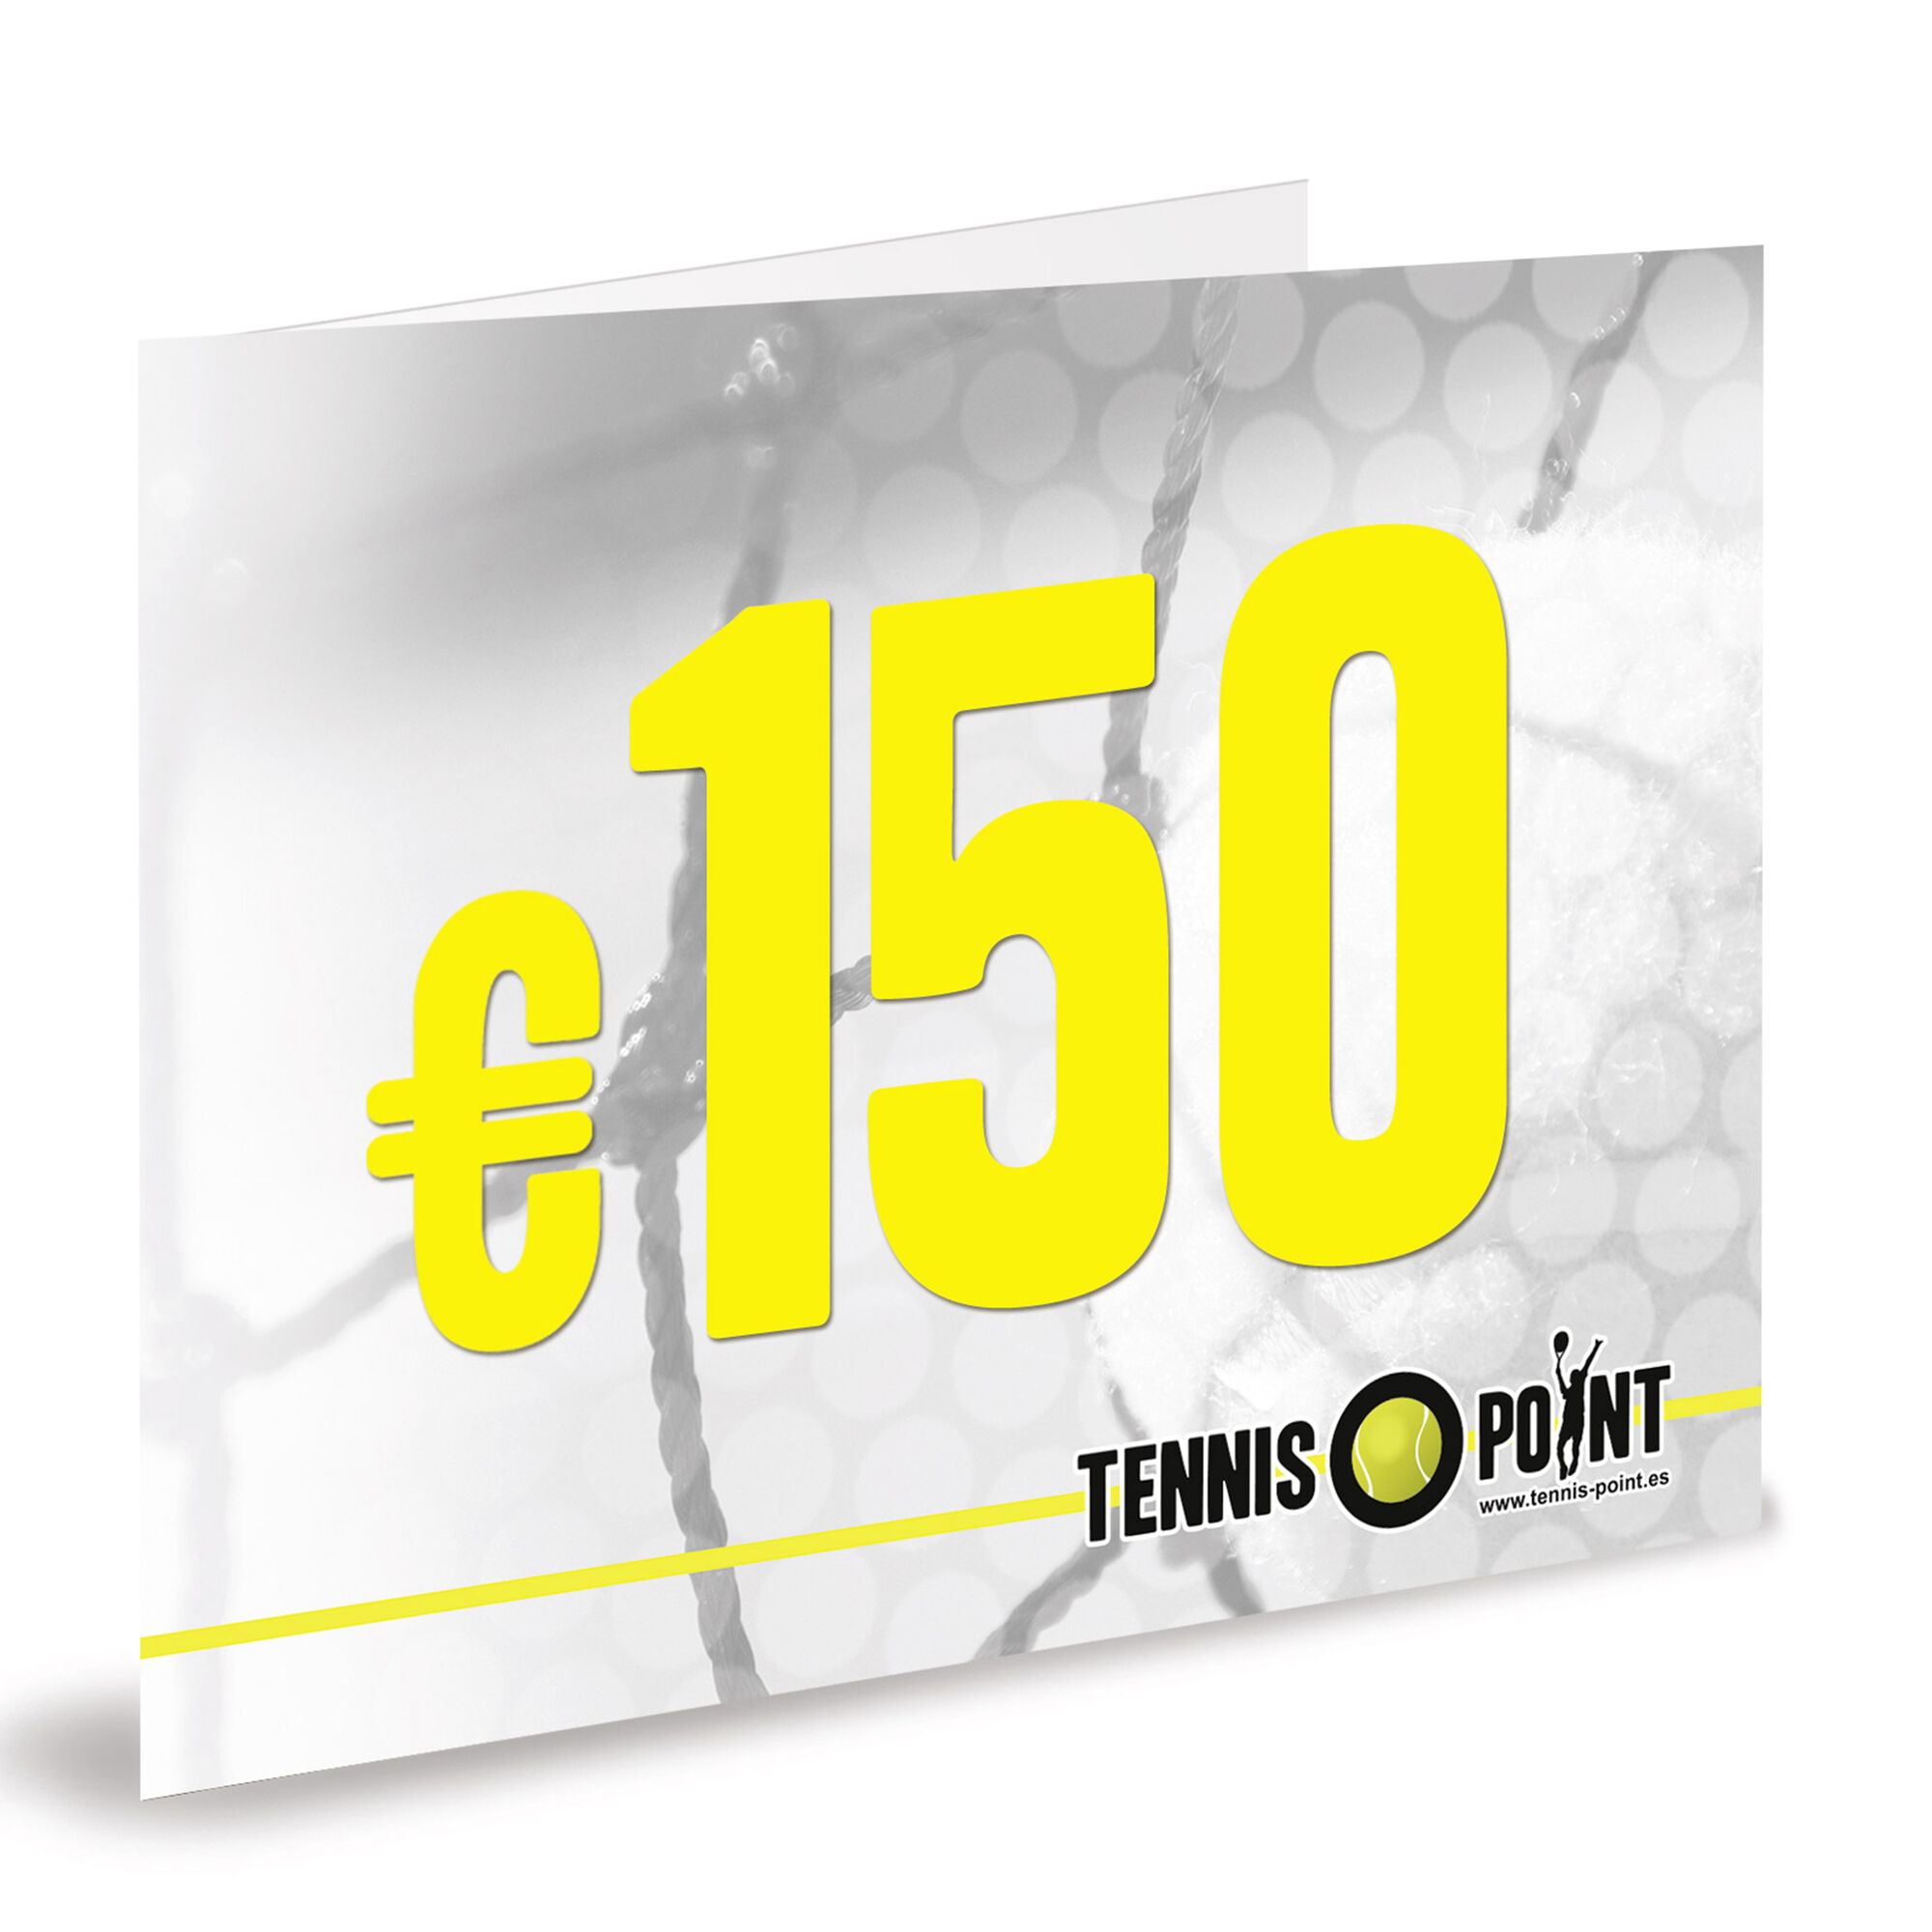 Tennis Point Gmbh